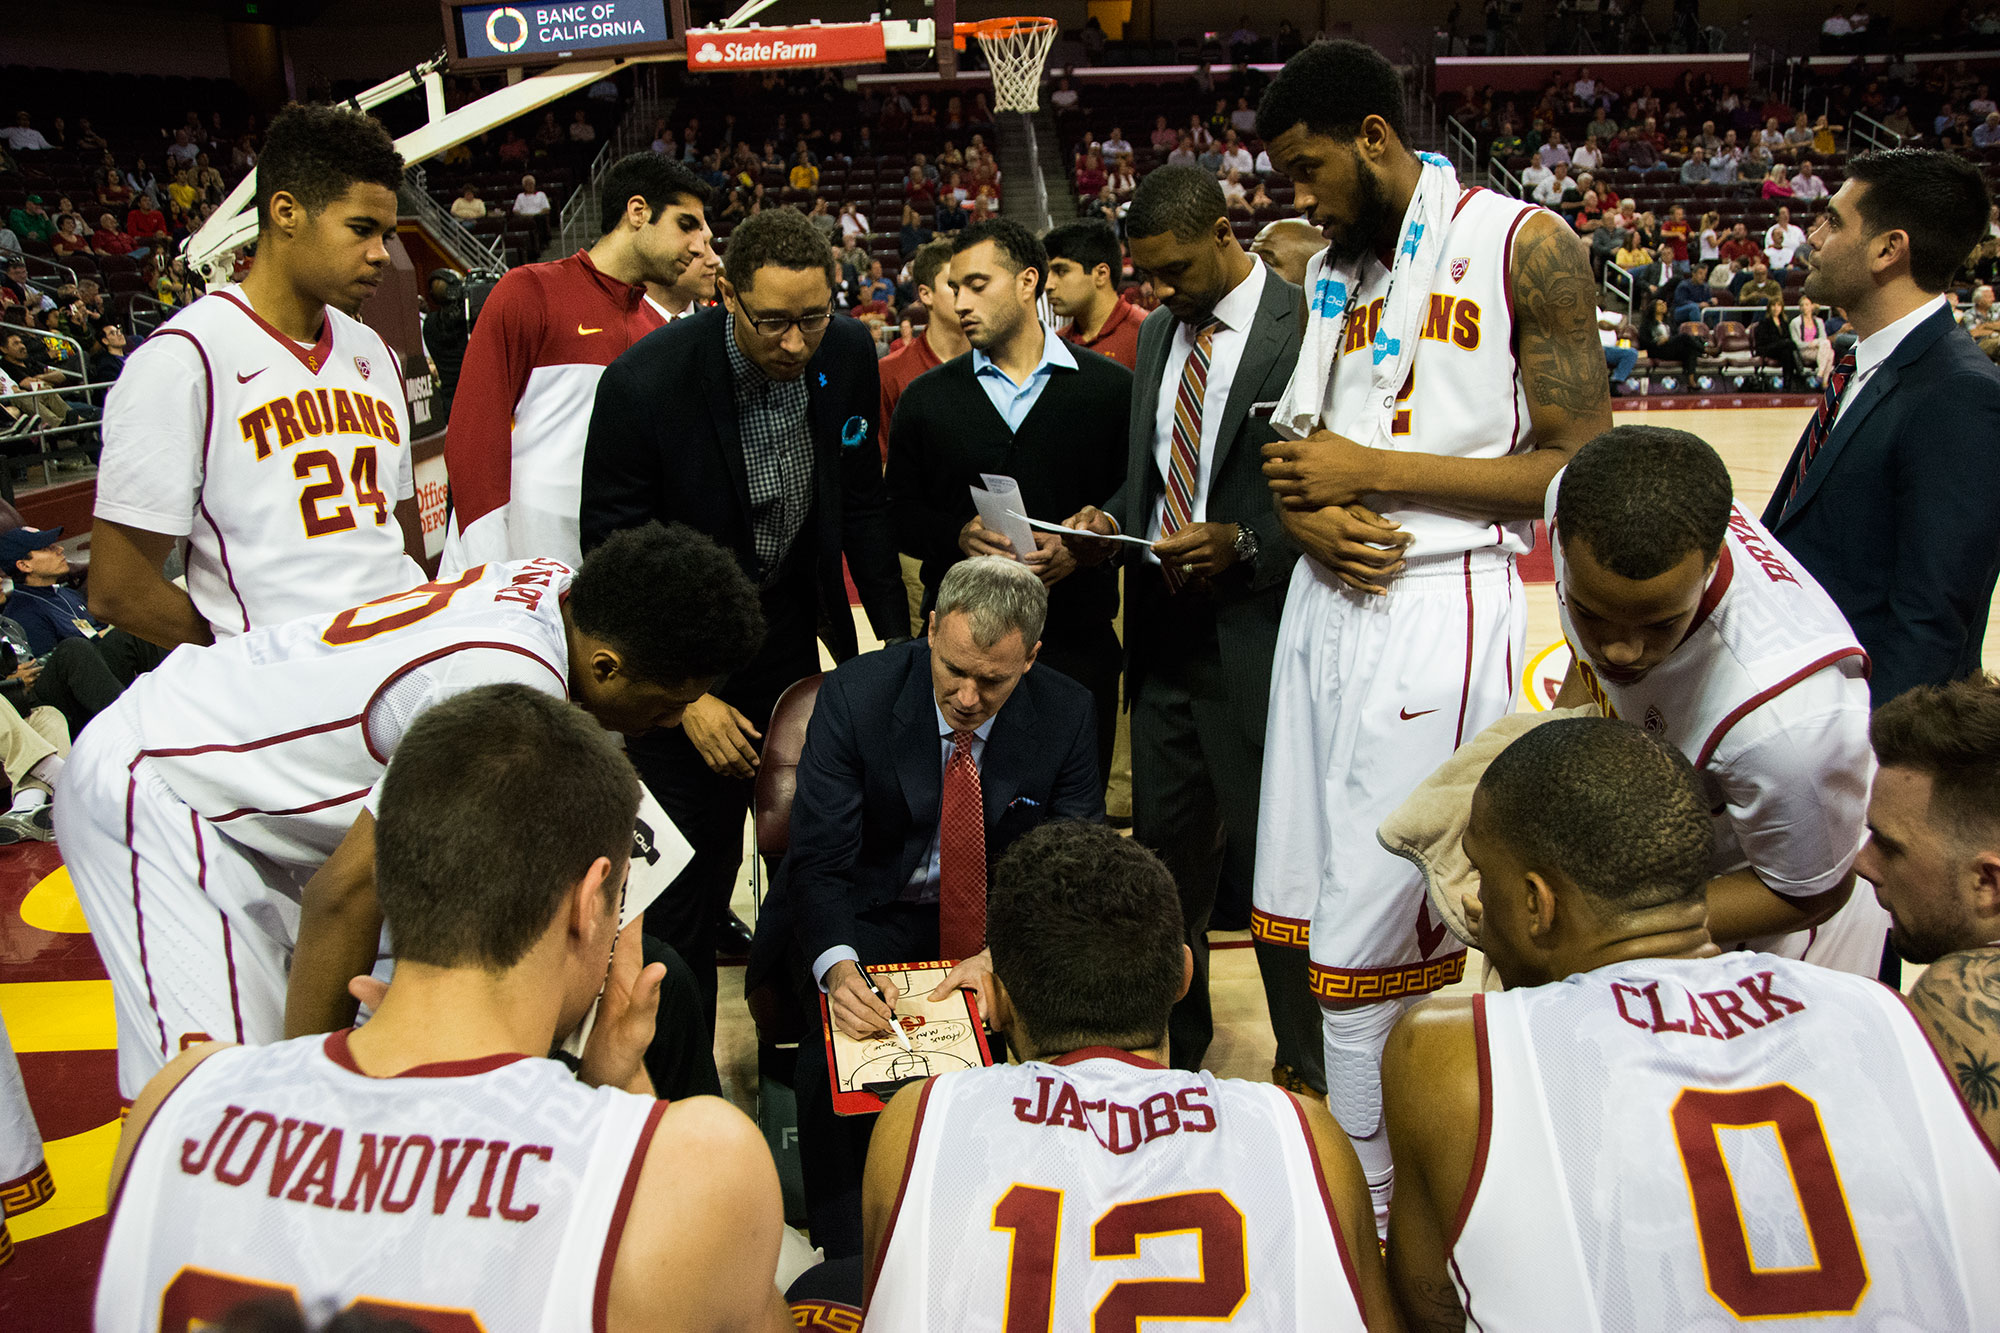 finest selection 9658c b82c5 In Photos: USC men's basketball falls to Oregon Ducks ...